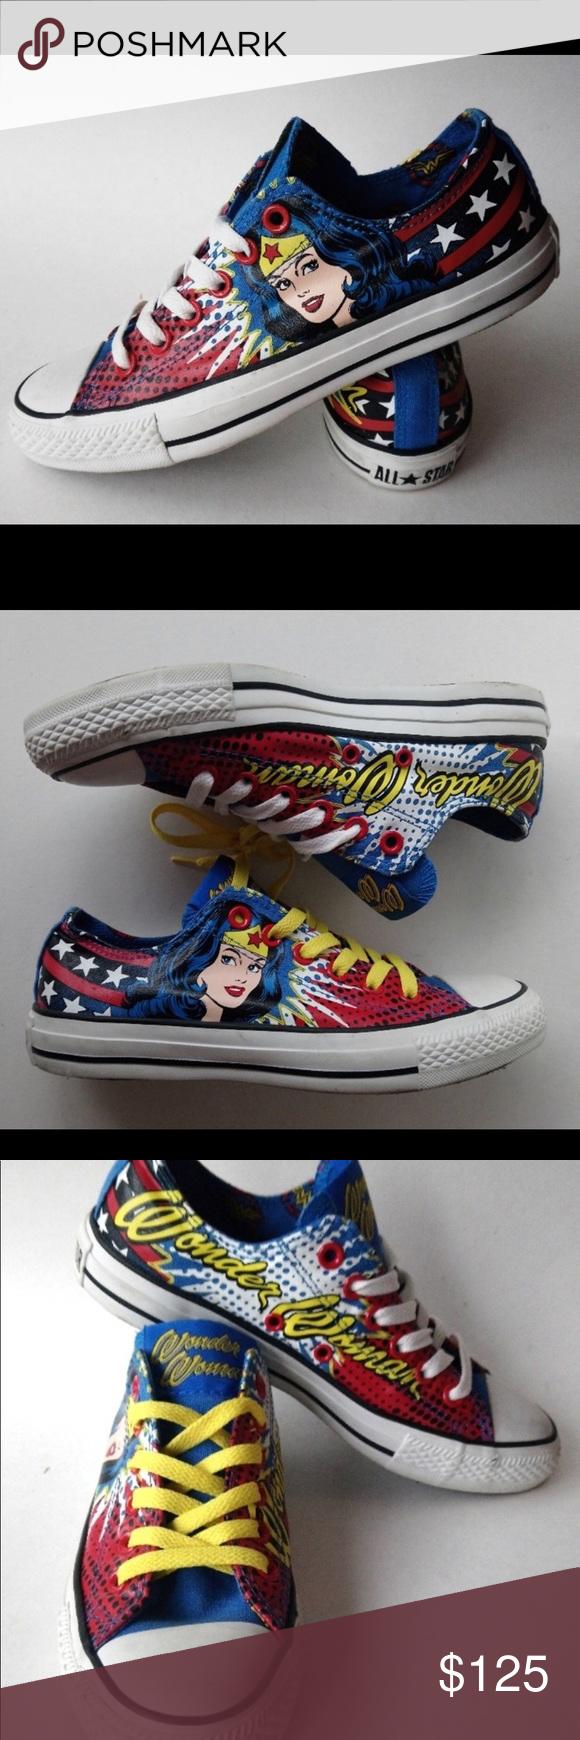 c29174c4b8b432 Custom Wonder Woman Chuck Taylor Converse. NEW DC Comics Custom ...